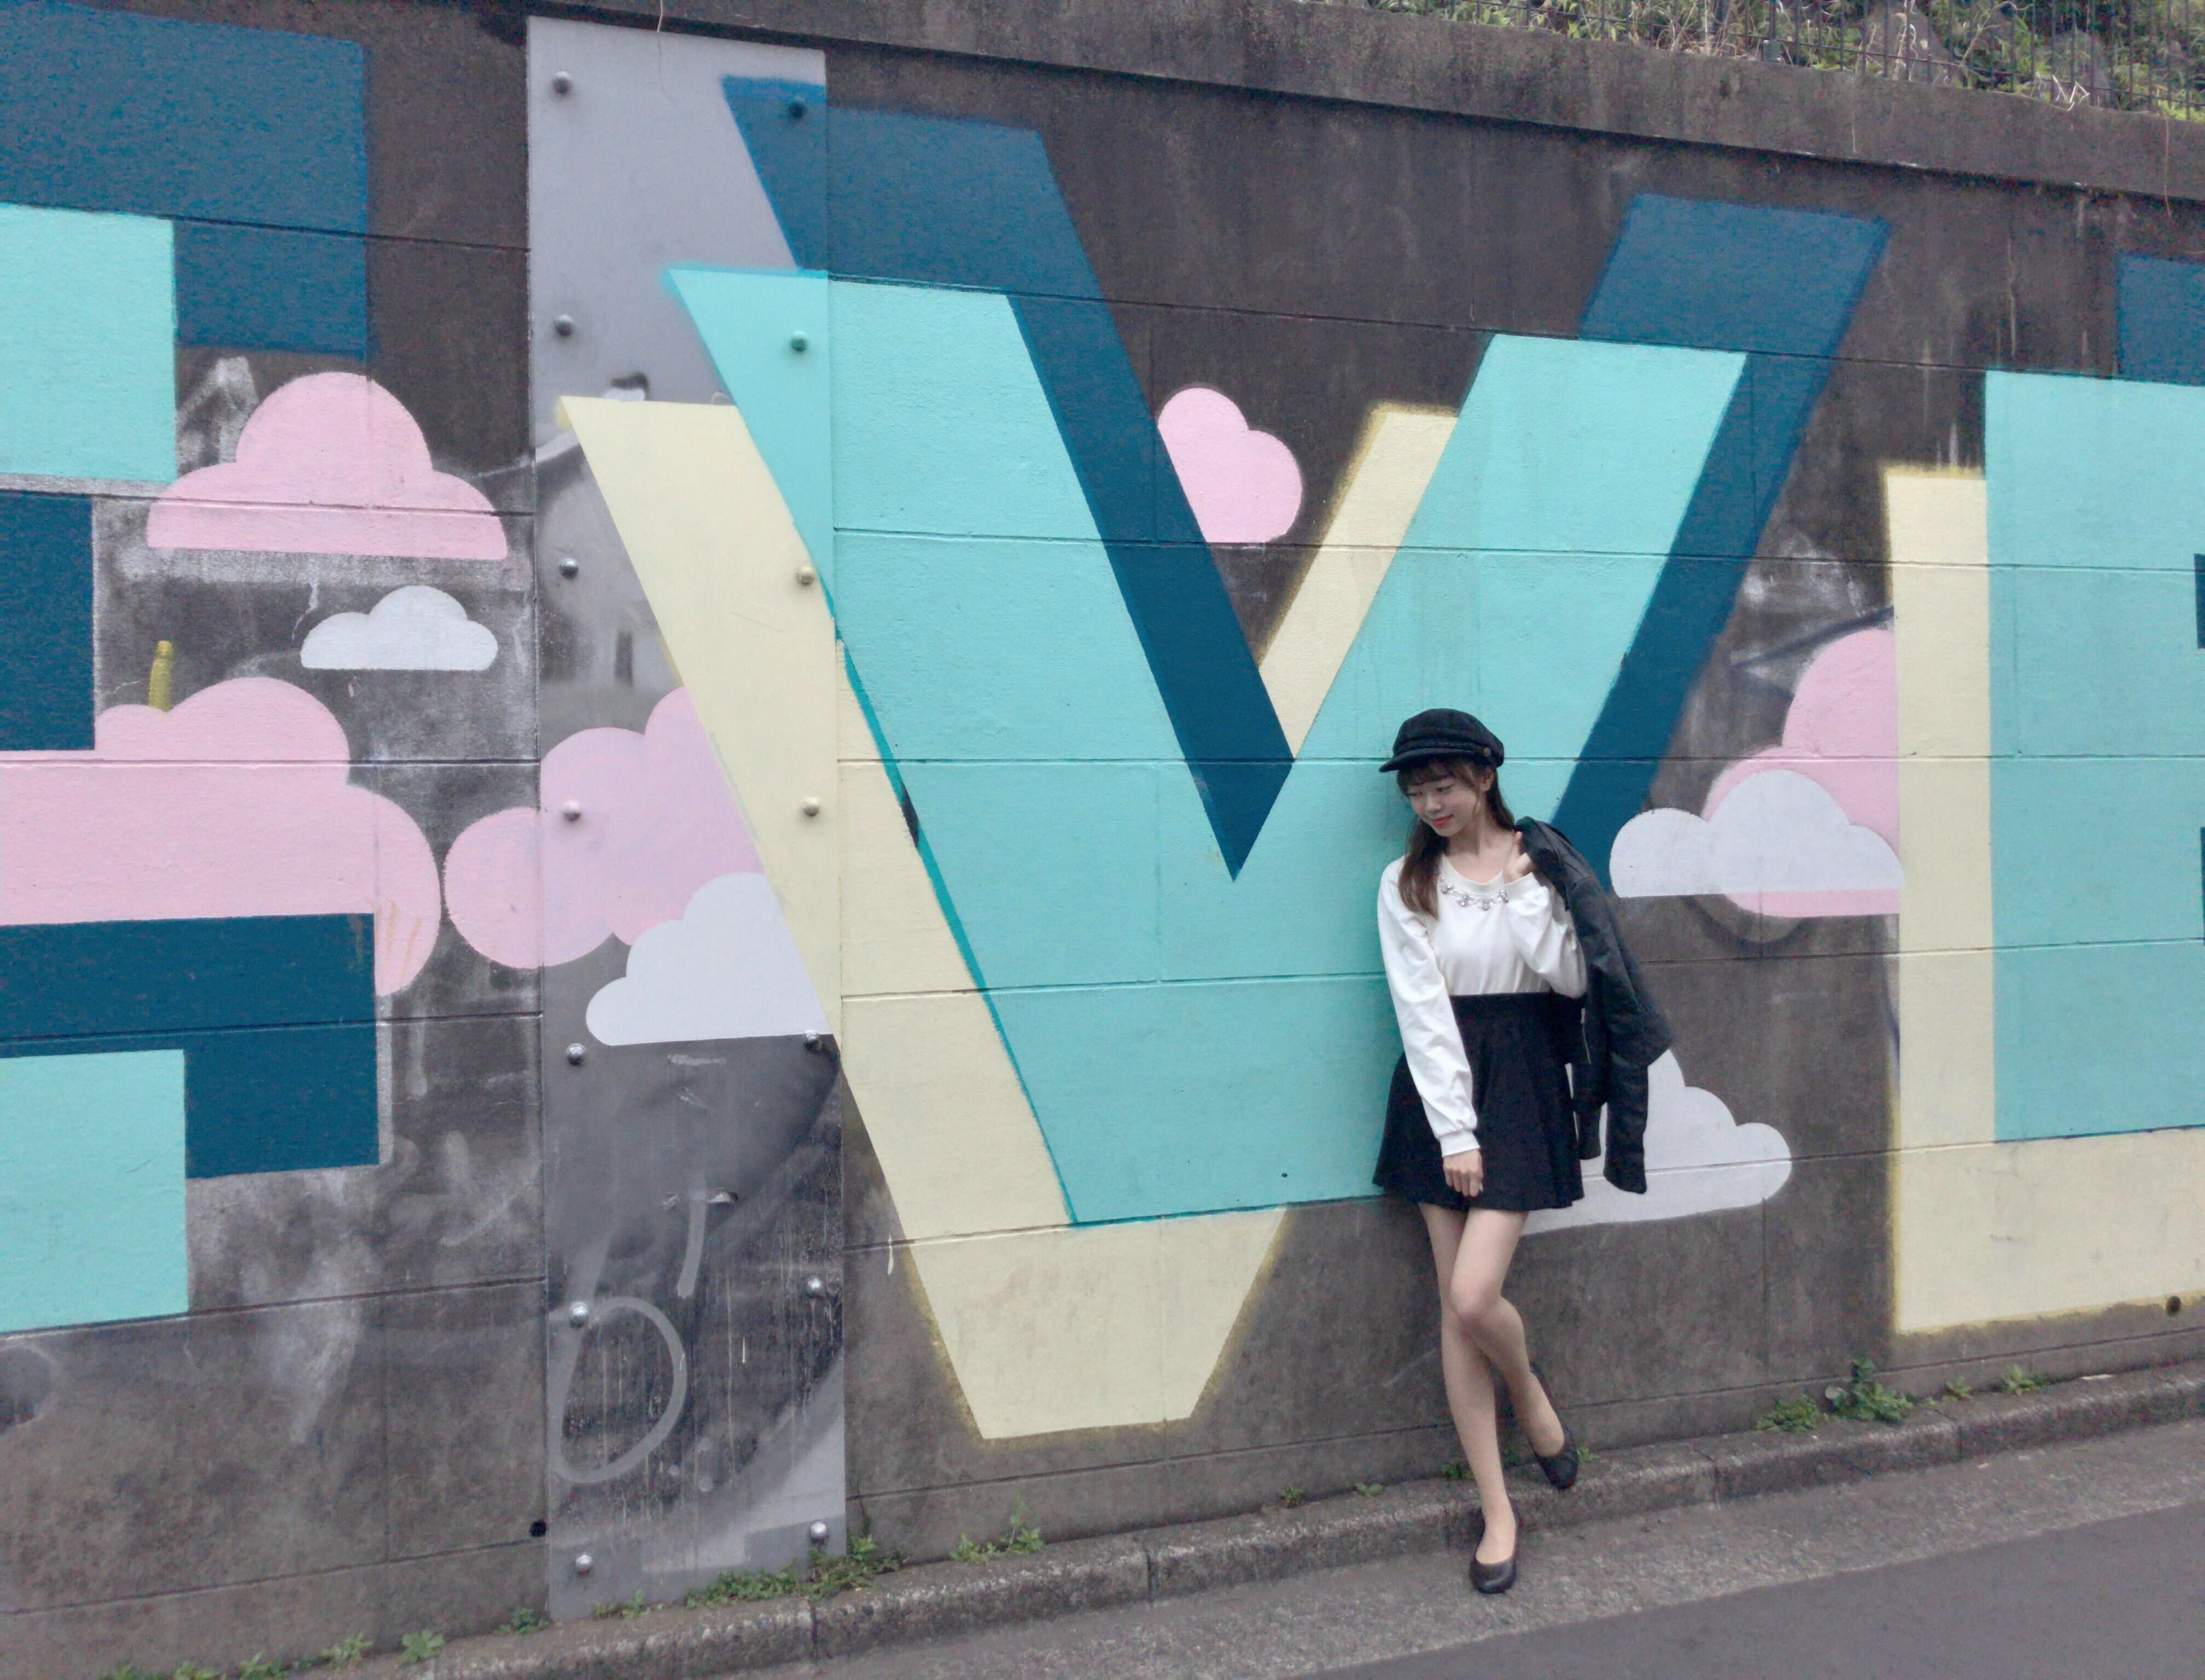 Vol.8♡ 男女ウケ間違いなし!【カジュアルモテ】ファッションとは!?_1_4